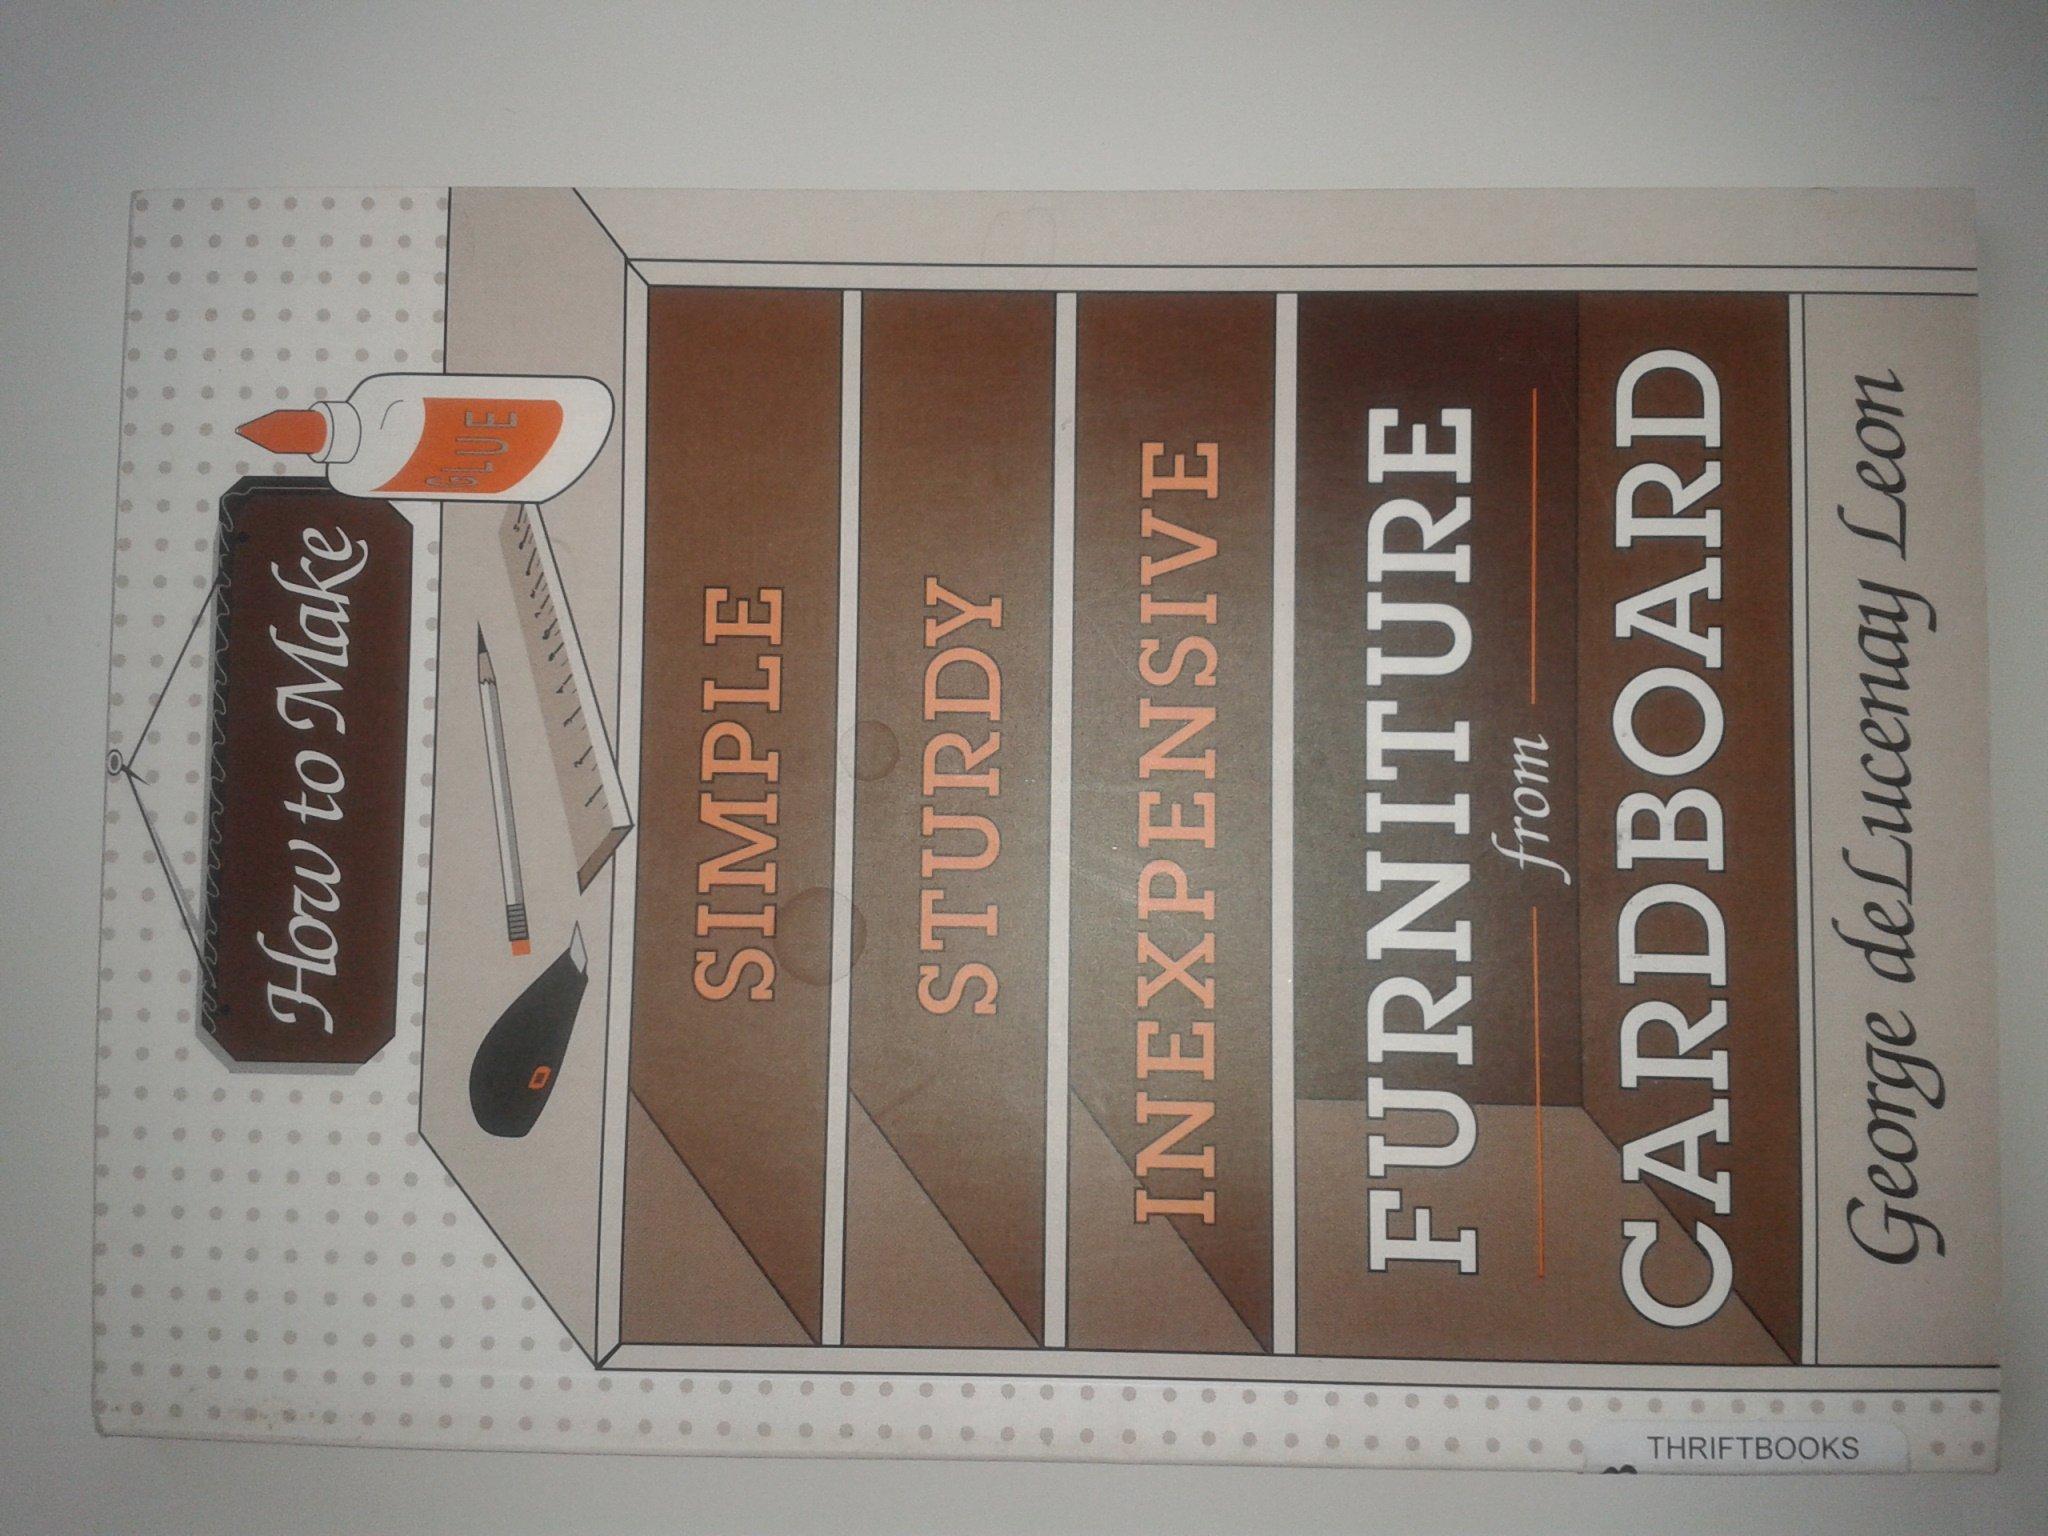 make cardboard furniture. How To Make Furniture From Cardboard: George Delucenay Leon: 9780811725484: Amazon.com: Books Cardboard